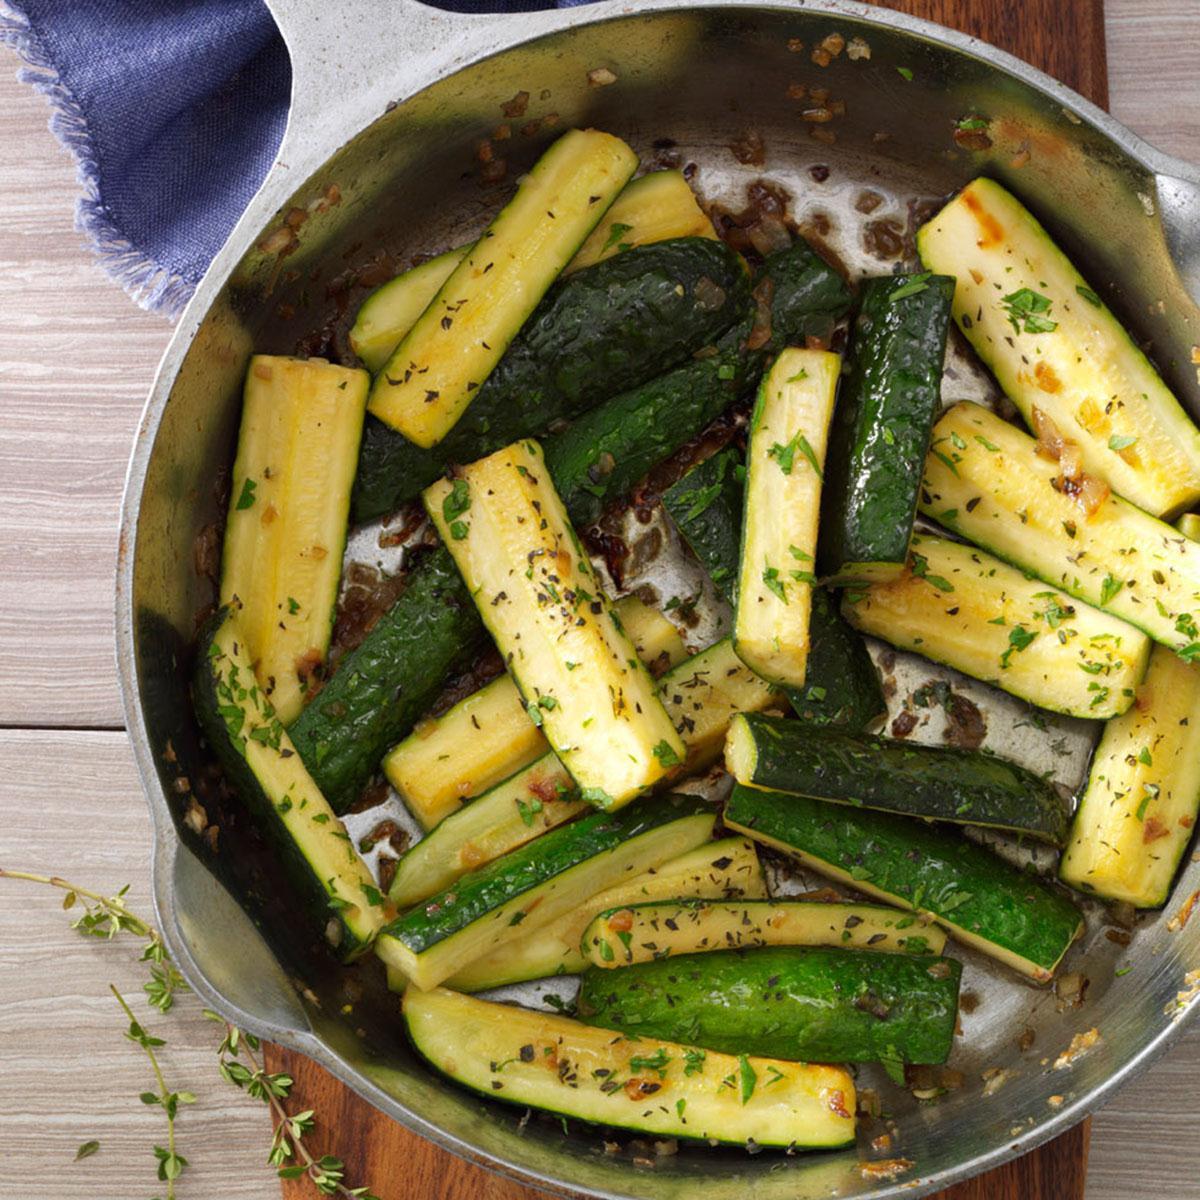 Healthy Zucchini Recipes  Thymed Zucchini Saute Recipe